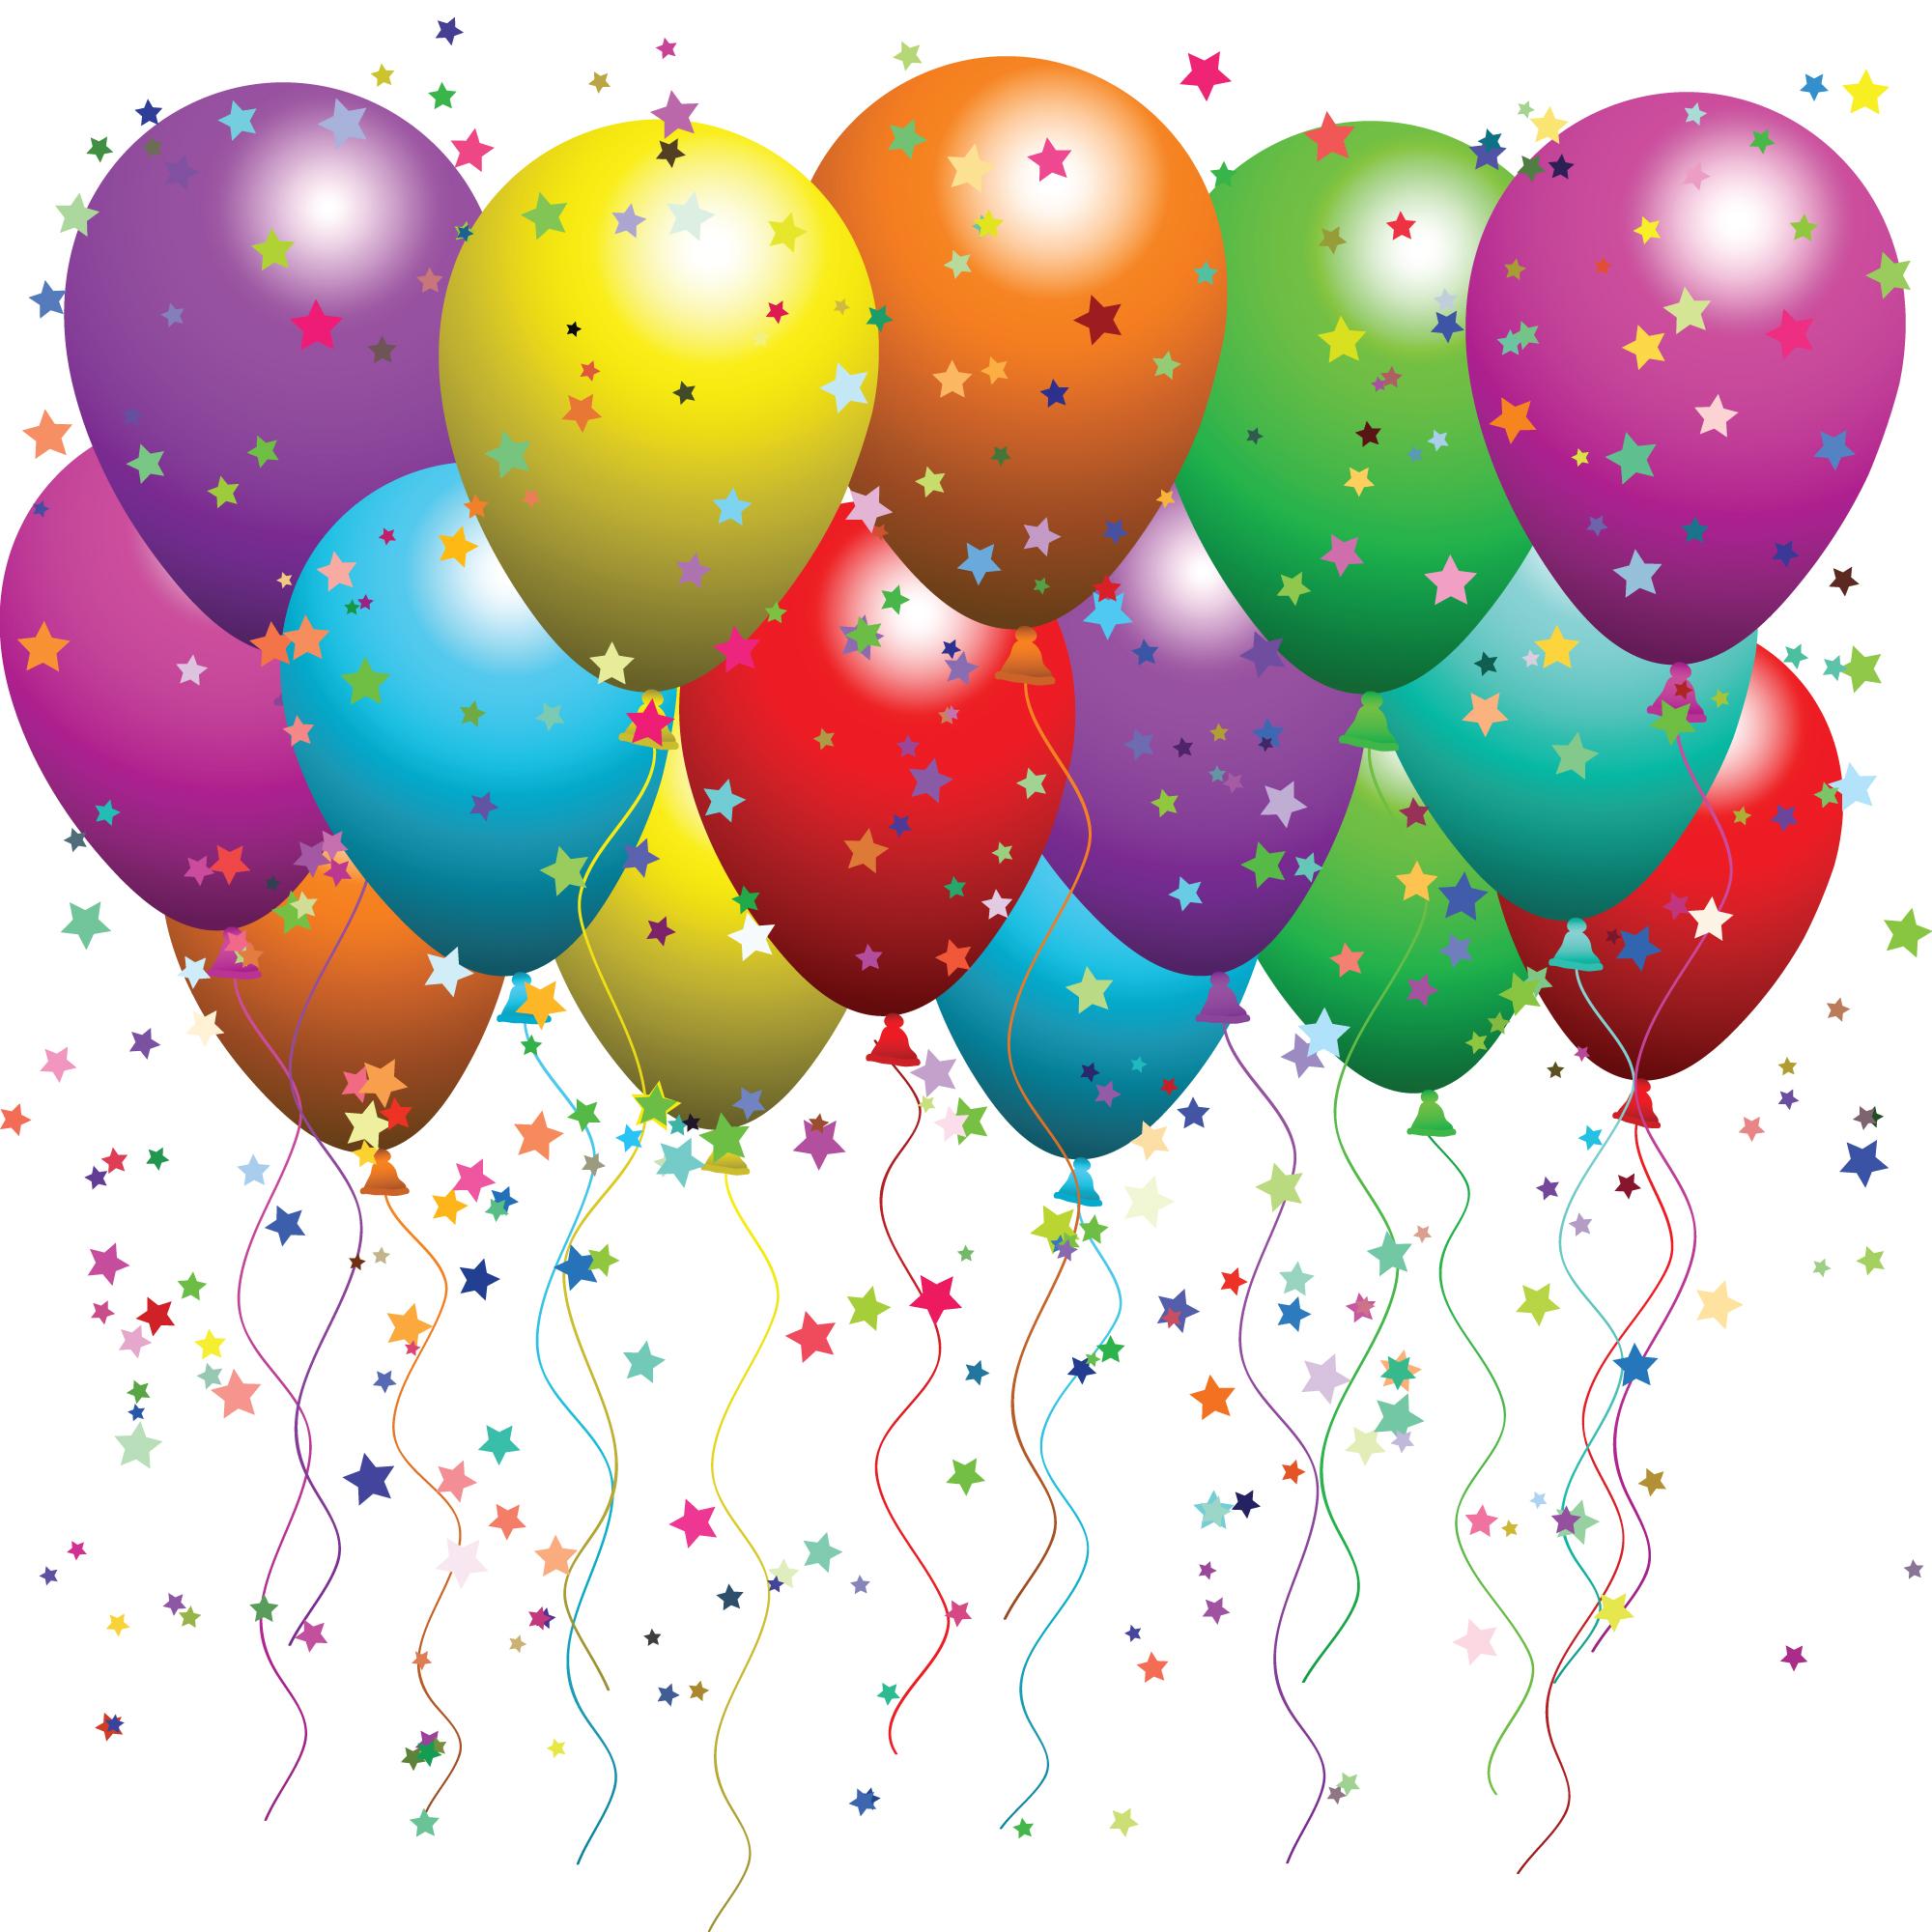 Birthday Balloon Backgrounds hd wallpaper background desktop 2000x2000